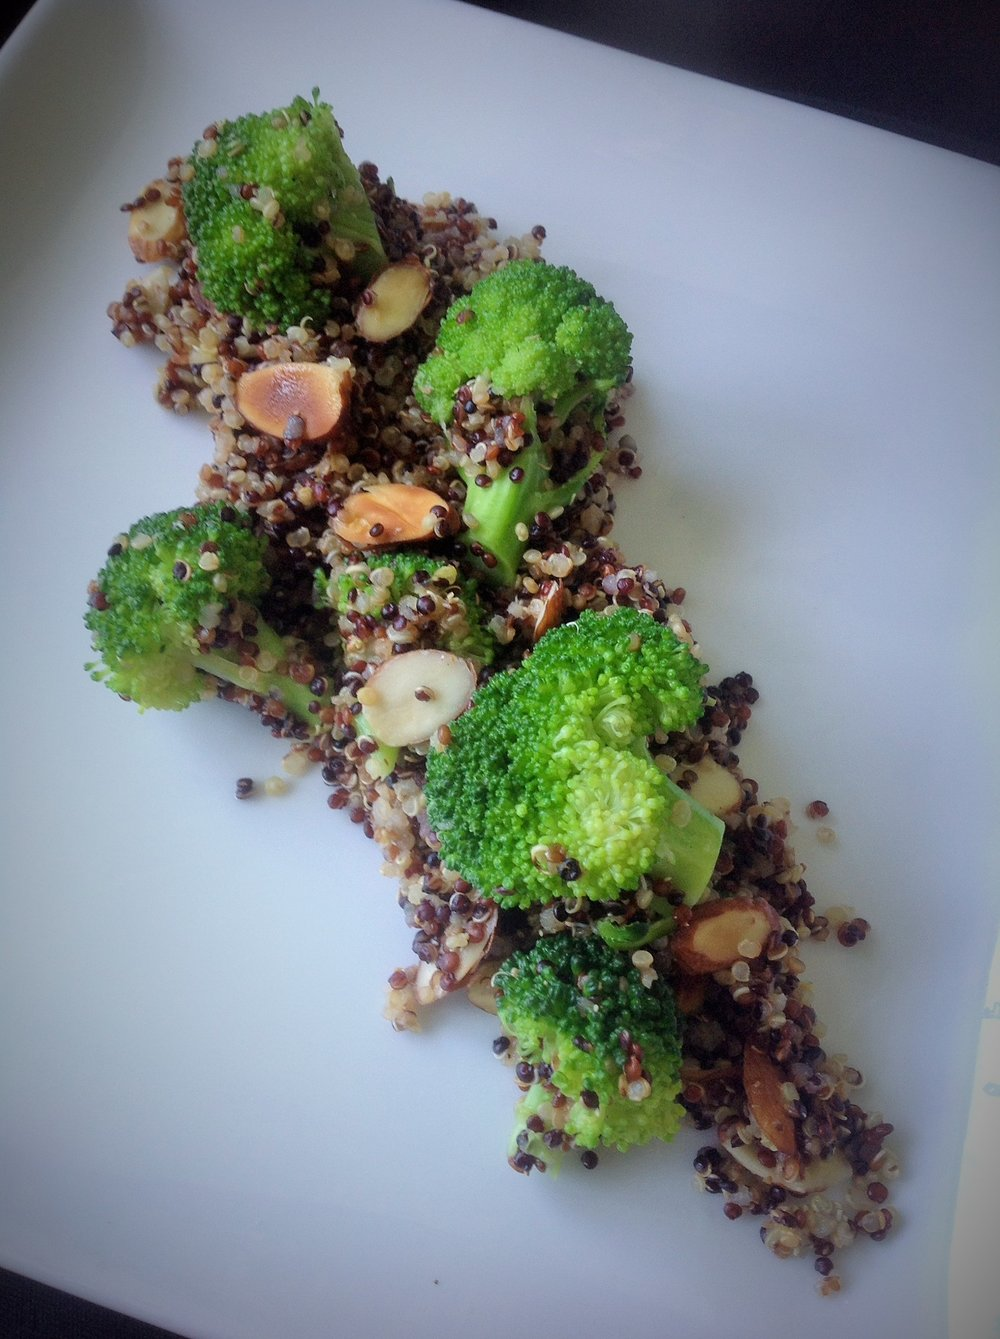 Lemon Broccoli Tri-Color Quinoa - Healthy, Gluten-Free, Oil-Free, Plant-Based, Organic, Vegan Salad